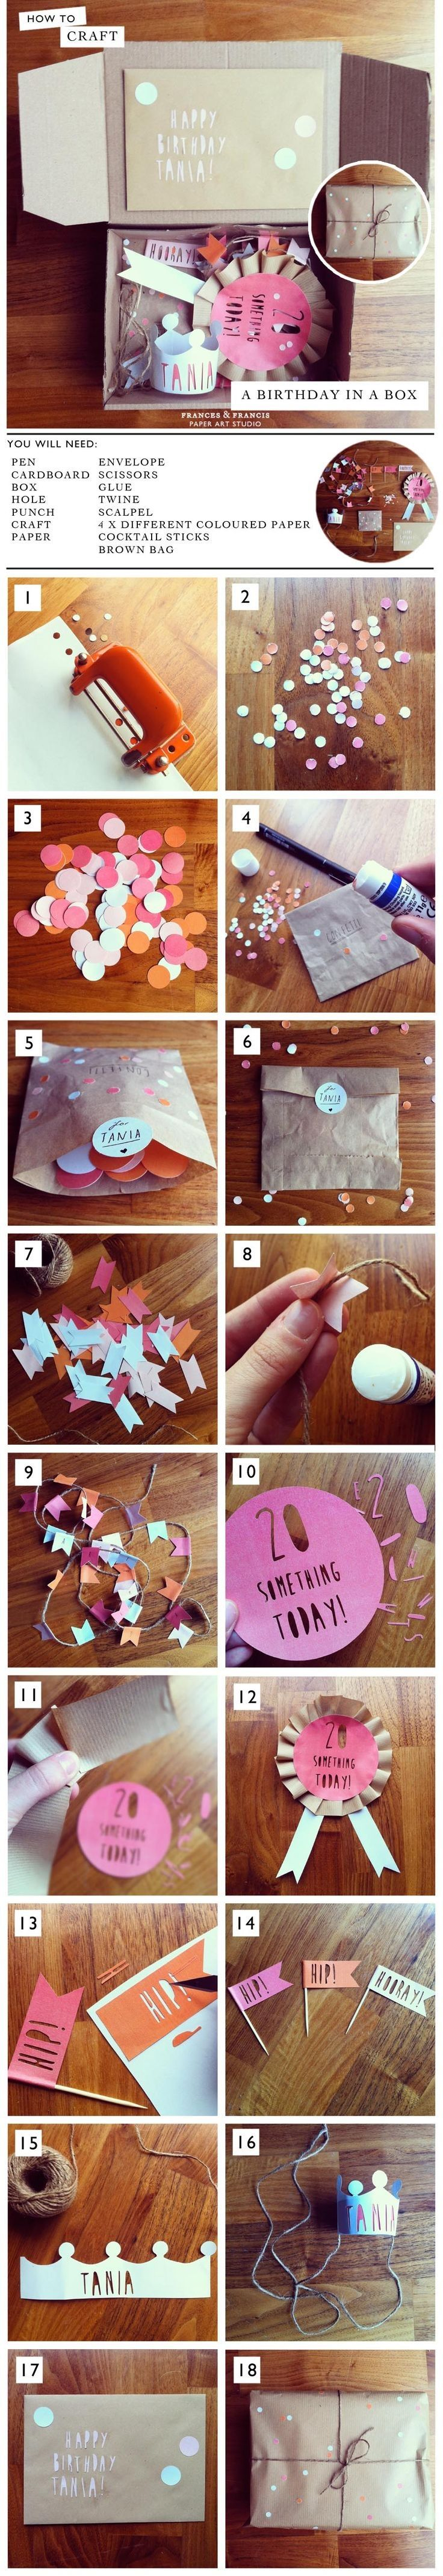 Birthday in A Box - DIY Surprise - 14 Pinspired DIY Birthday Gift Tutorials